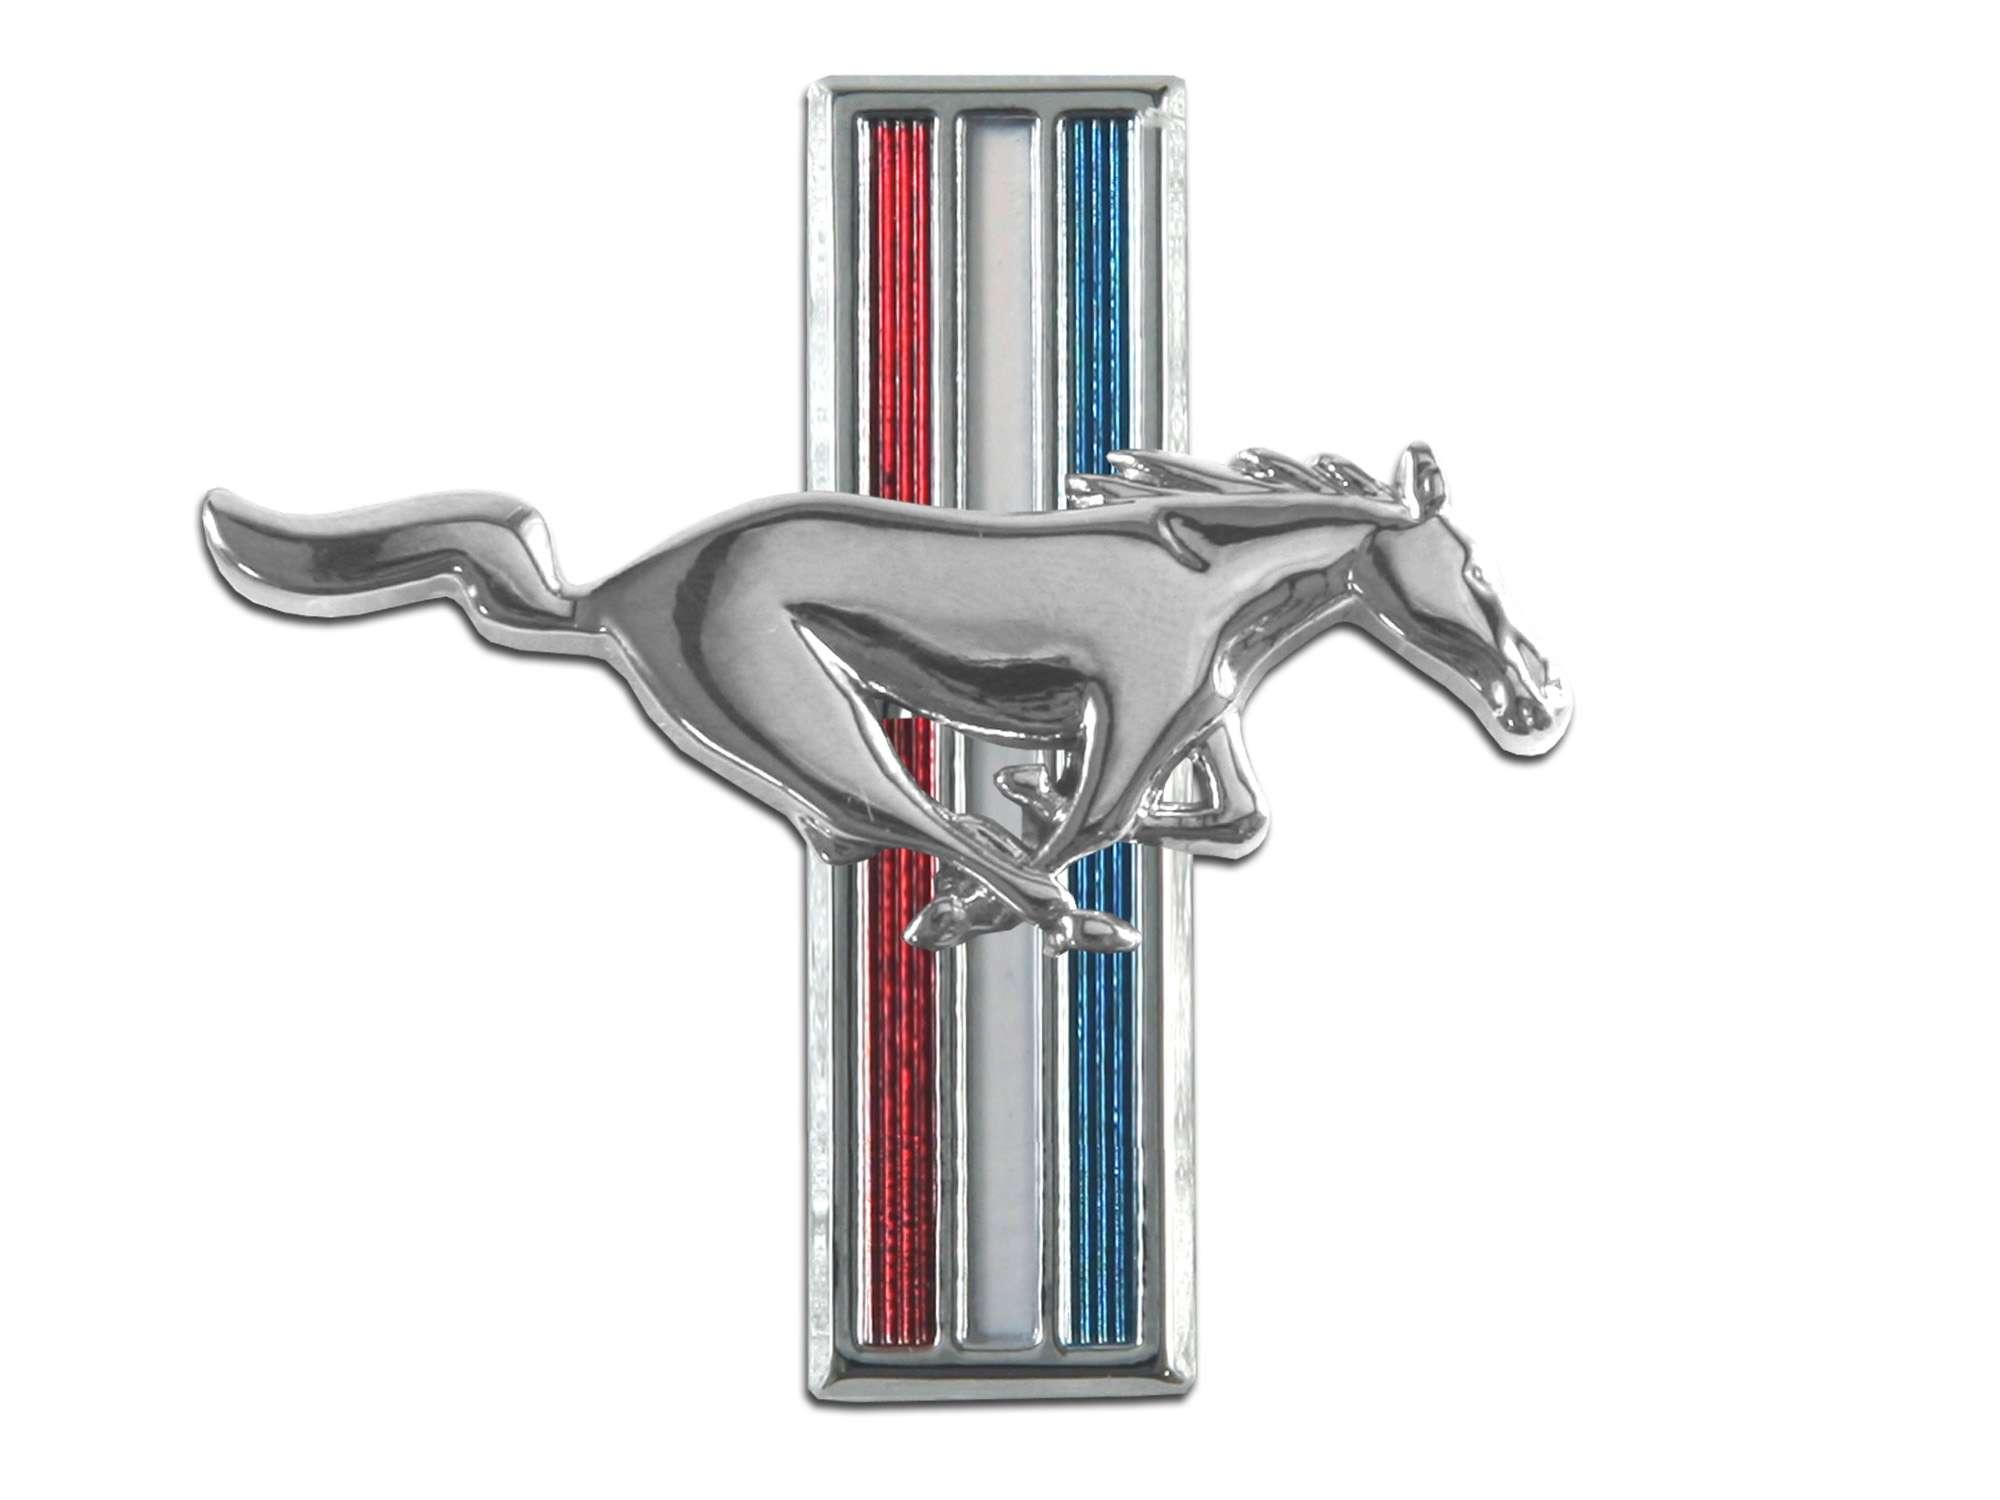 64 68 Ford Mustang Emblem Kotflügel Rechts